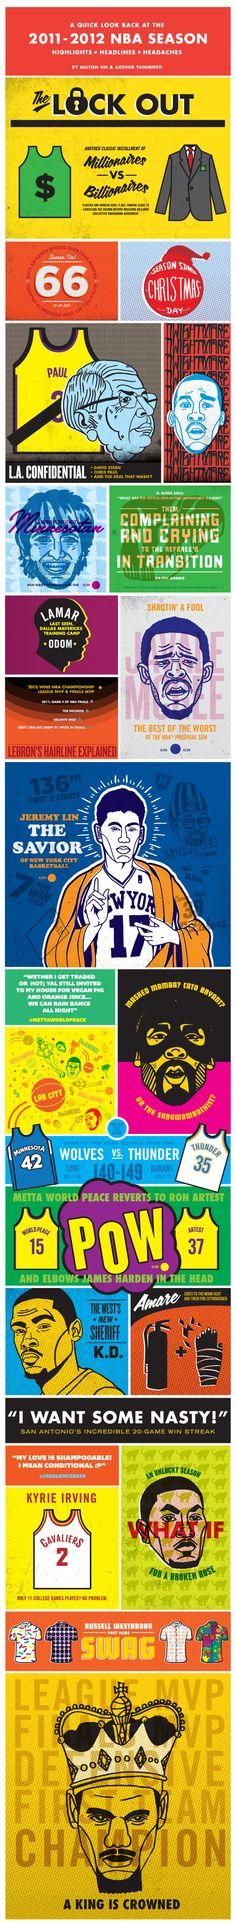 2011-12 NBA Season Recap